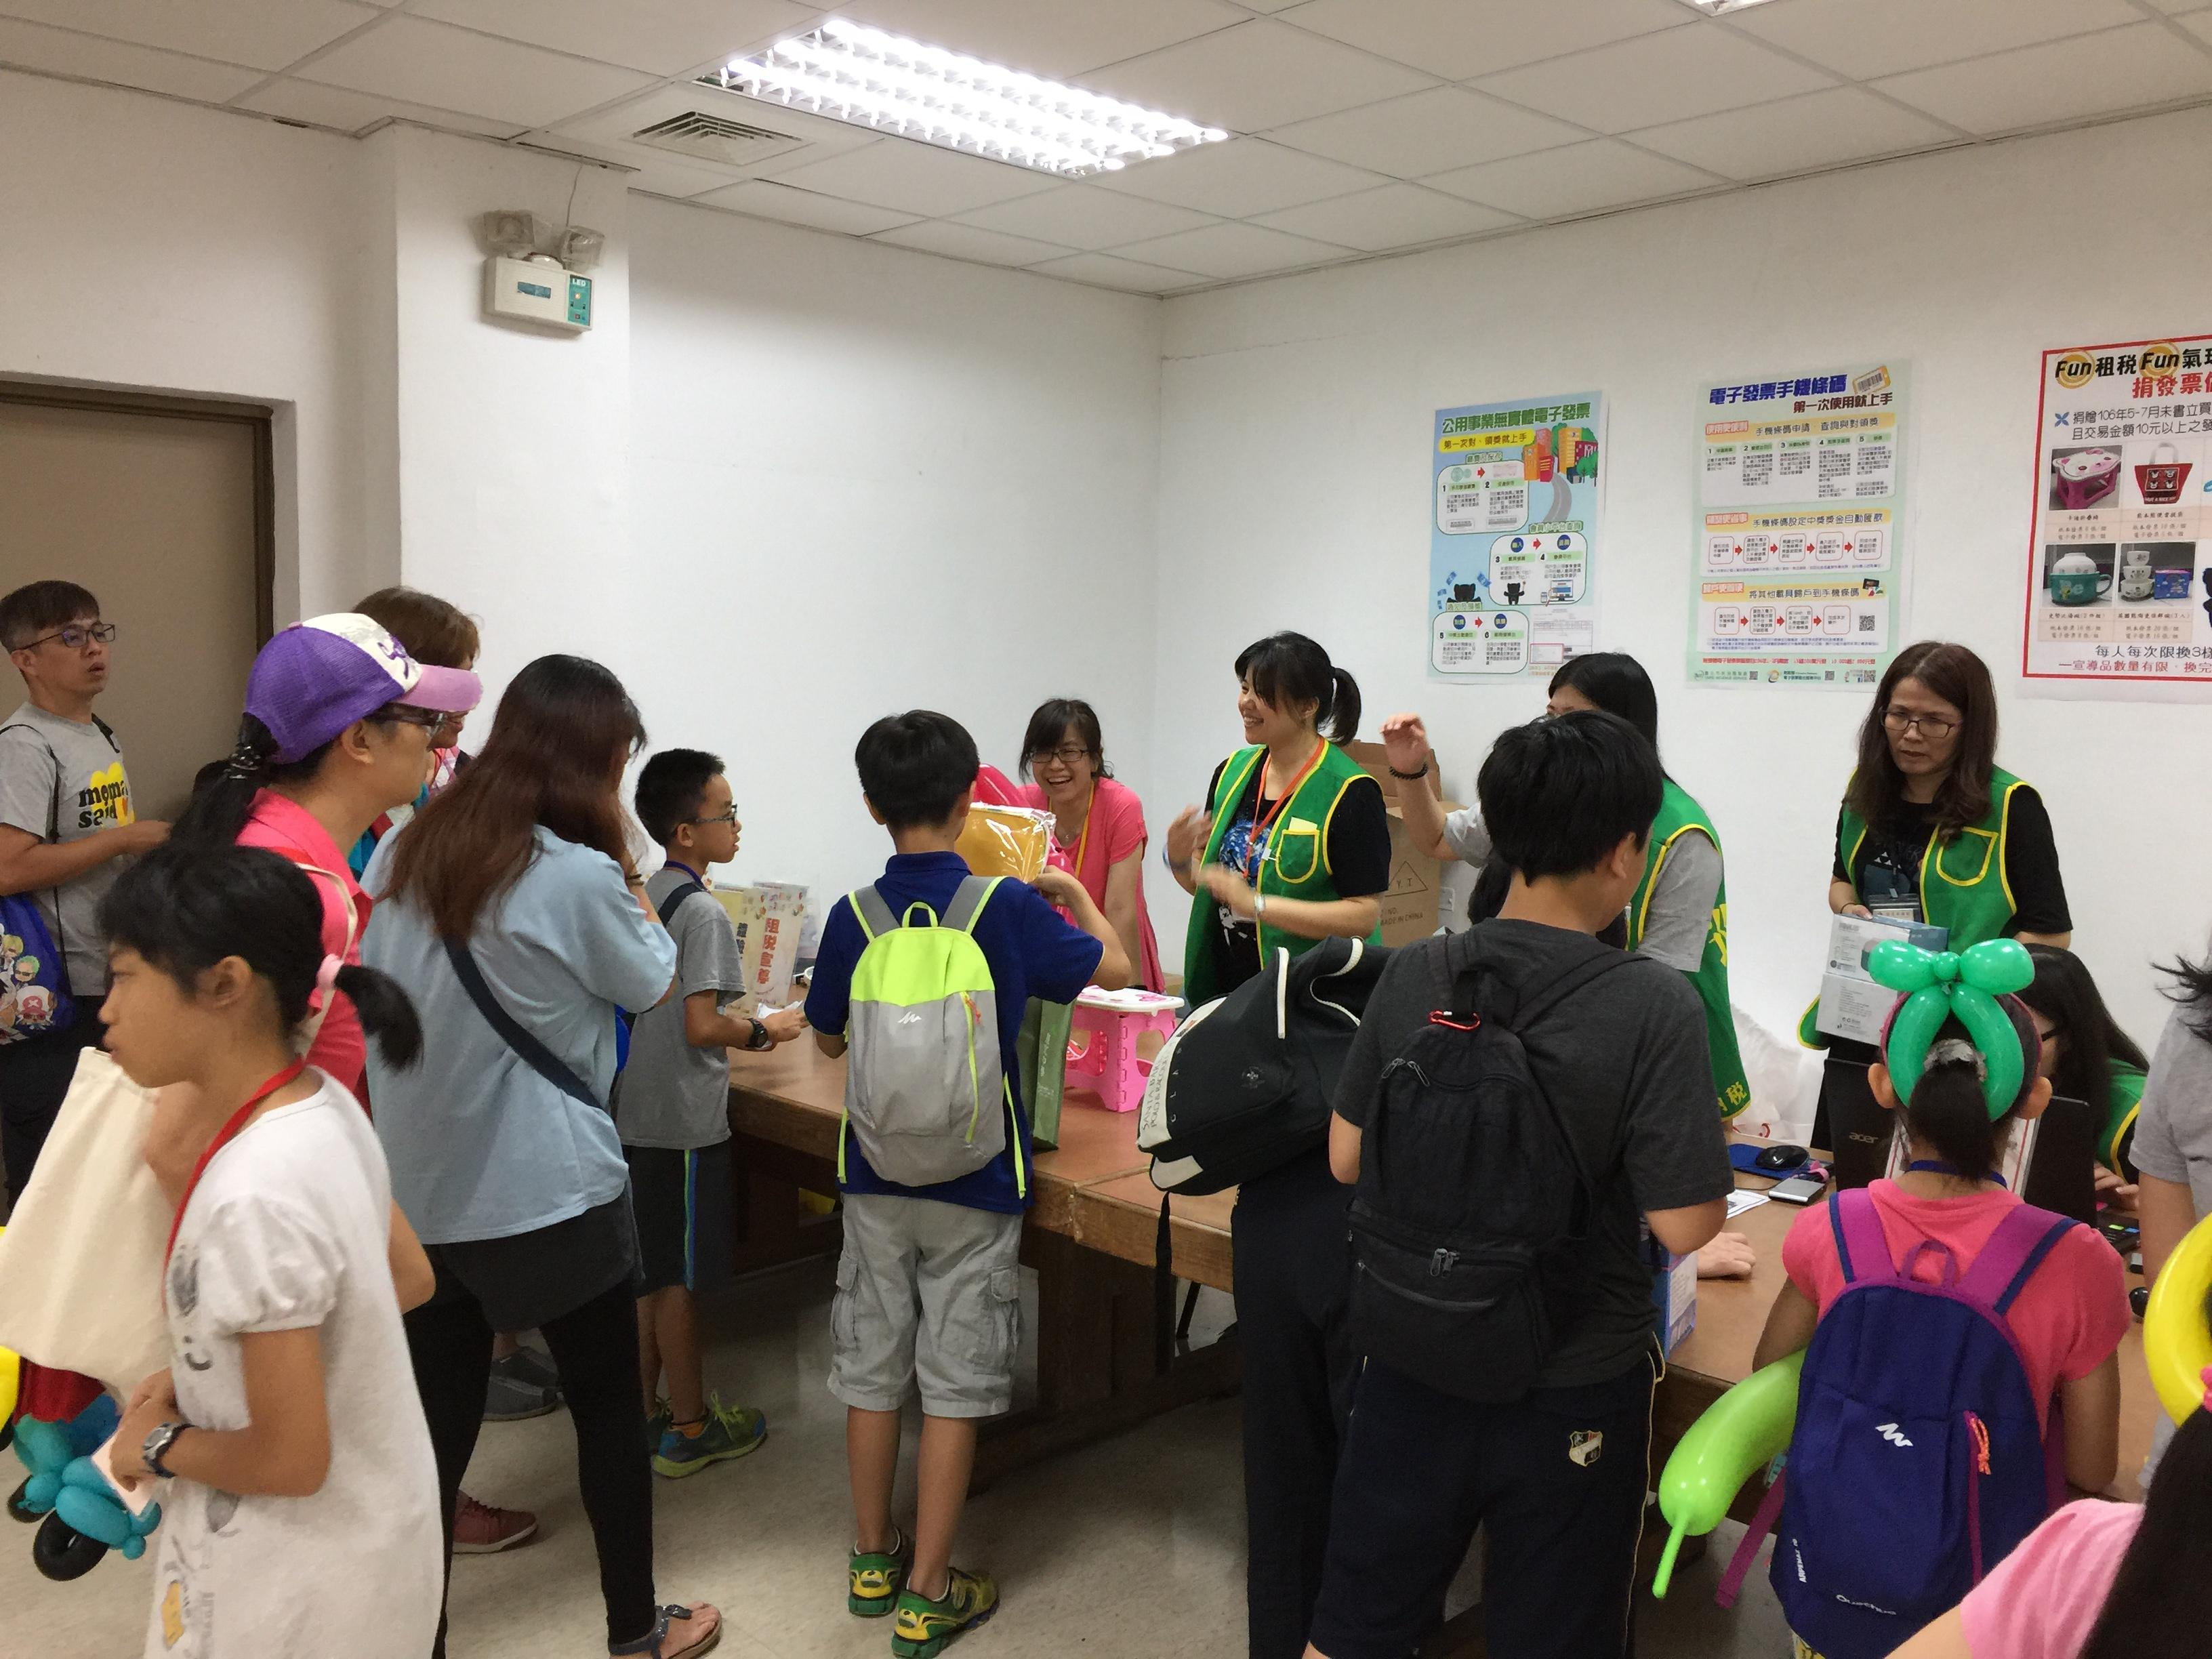 106Fun租稅Fun氣球活動照片41捐發票做公益活動